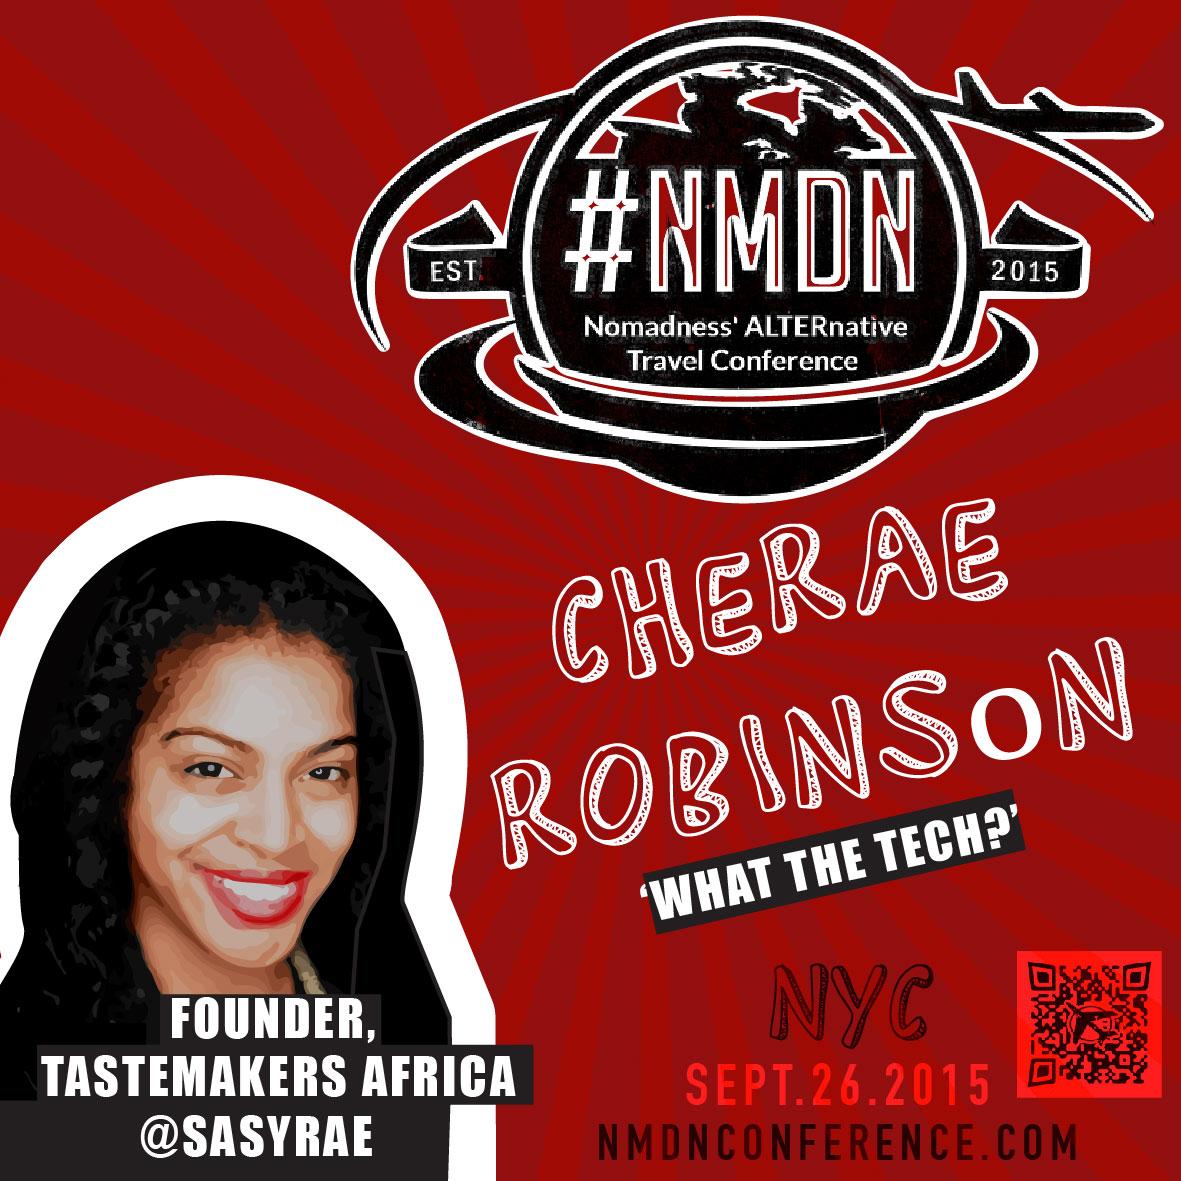 Cherae Robinson Badge-01.jpg